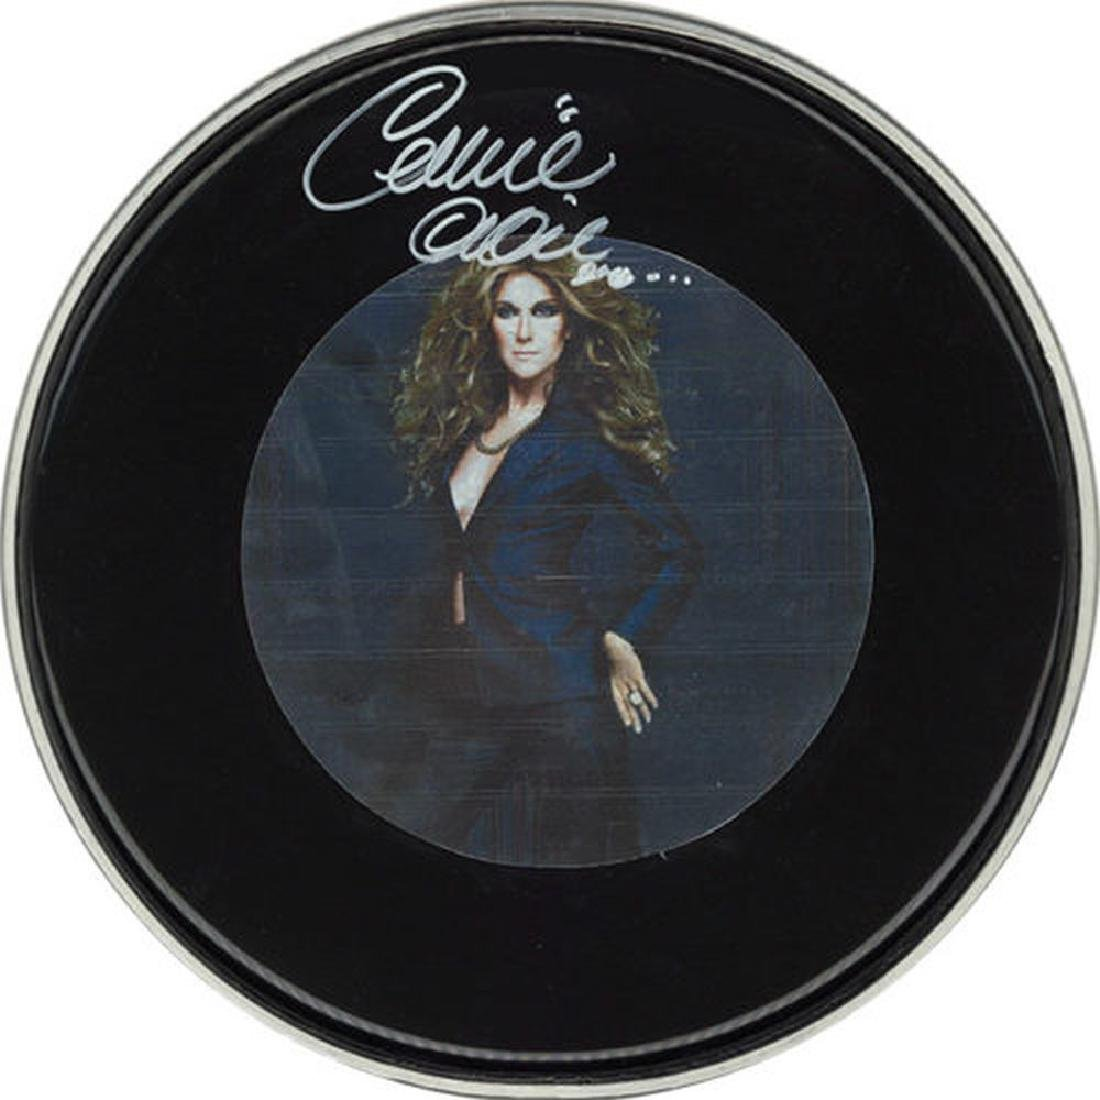 Celine Dion Drum Head